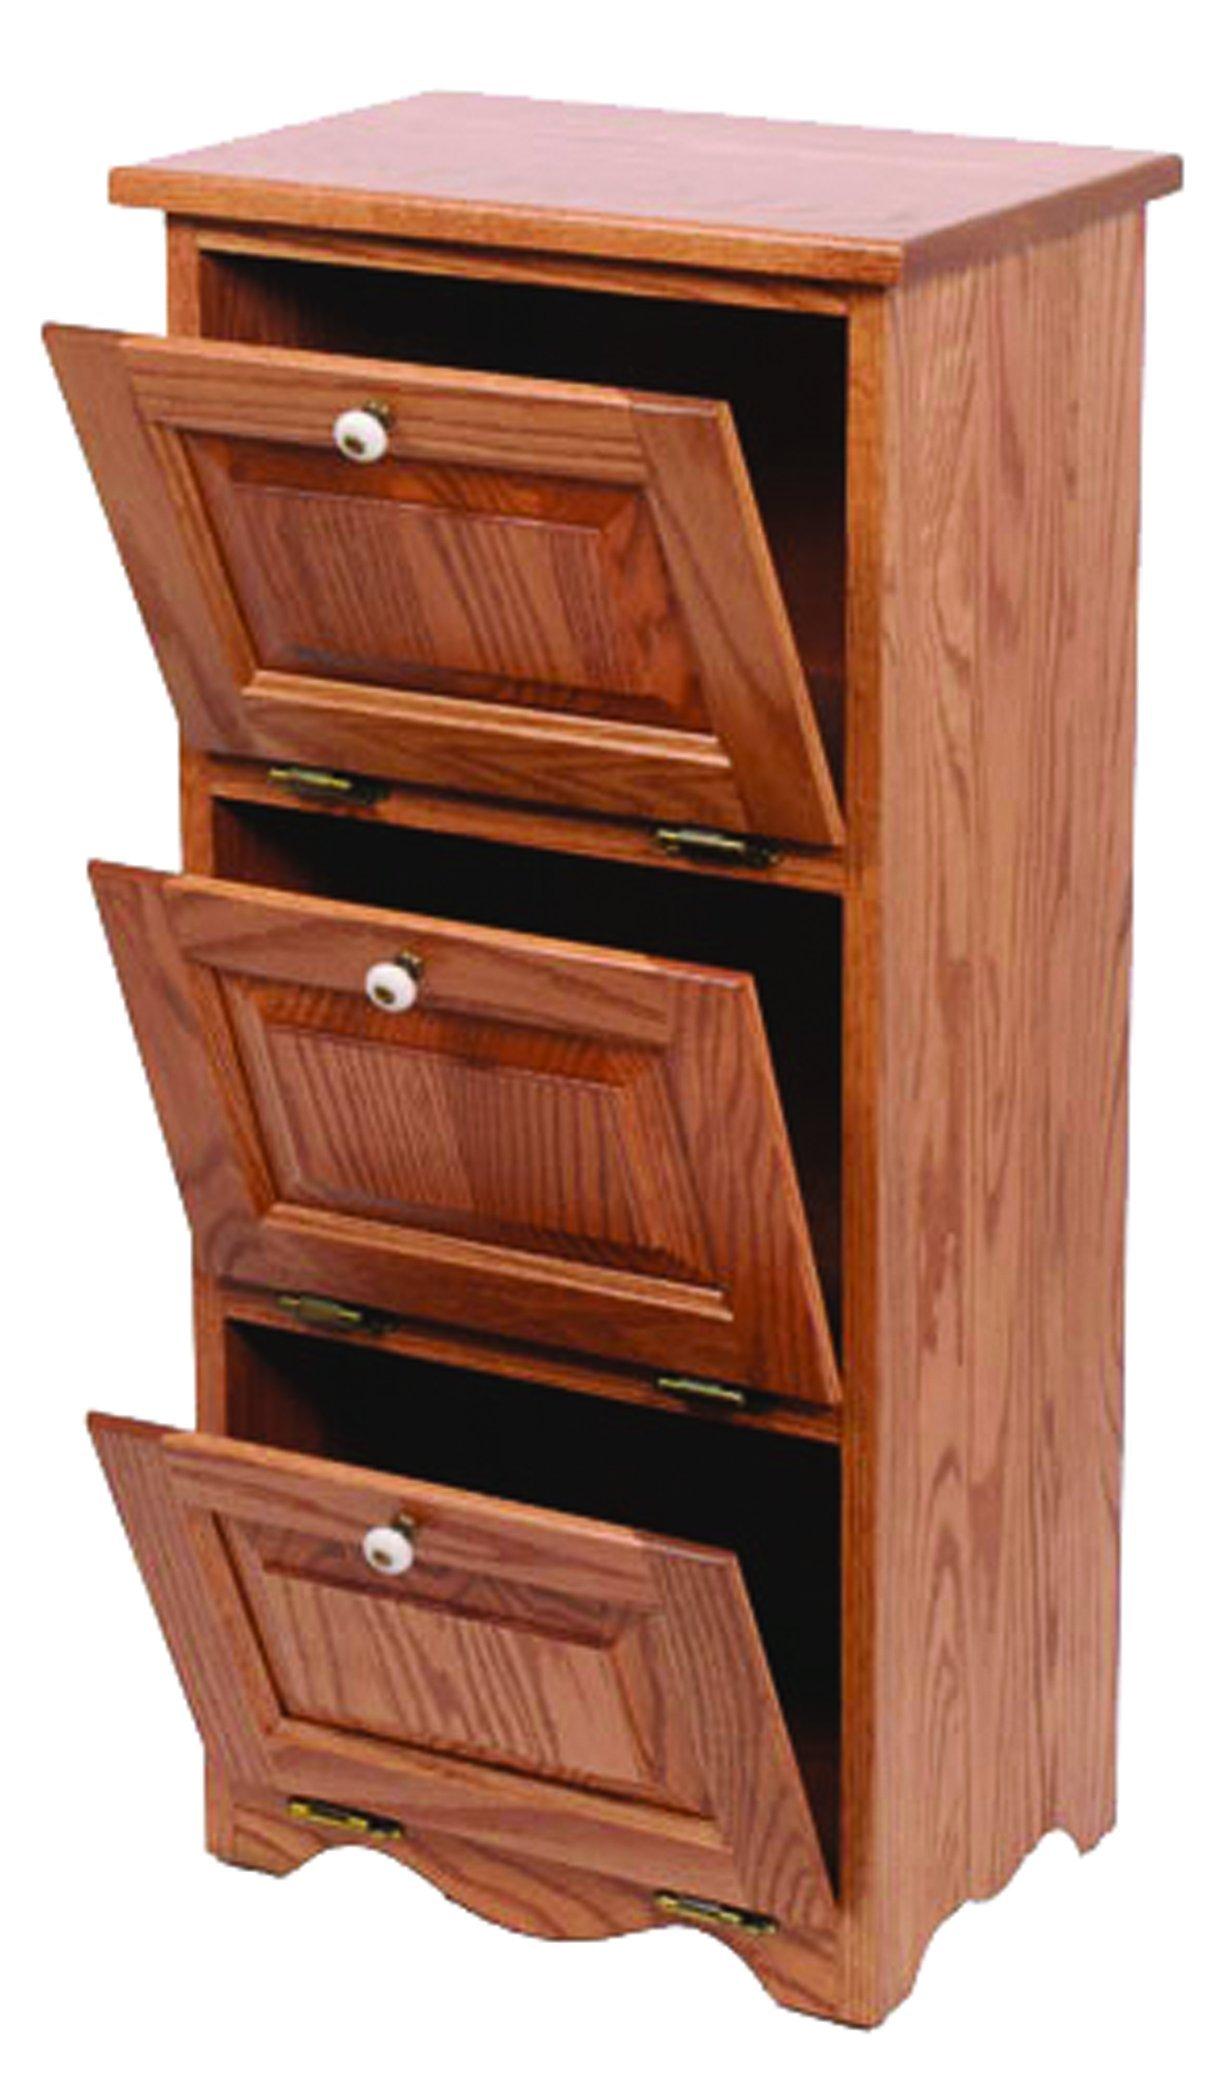 Oak 3 Door Vegetable Bin - Amish Made in USA by Furniture Barn USA